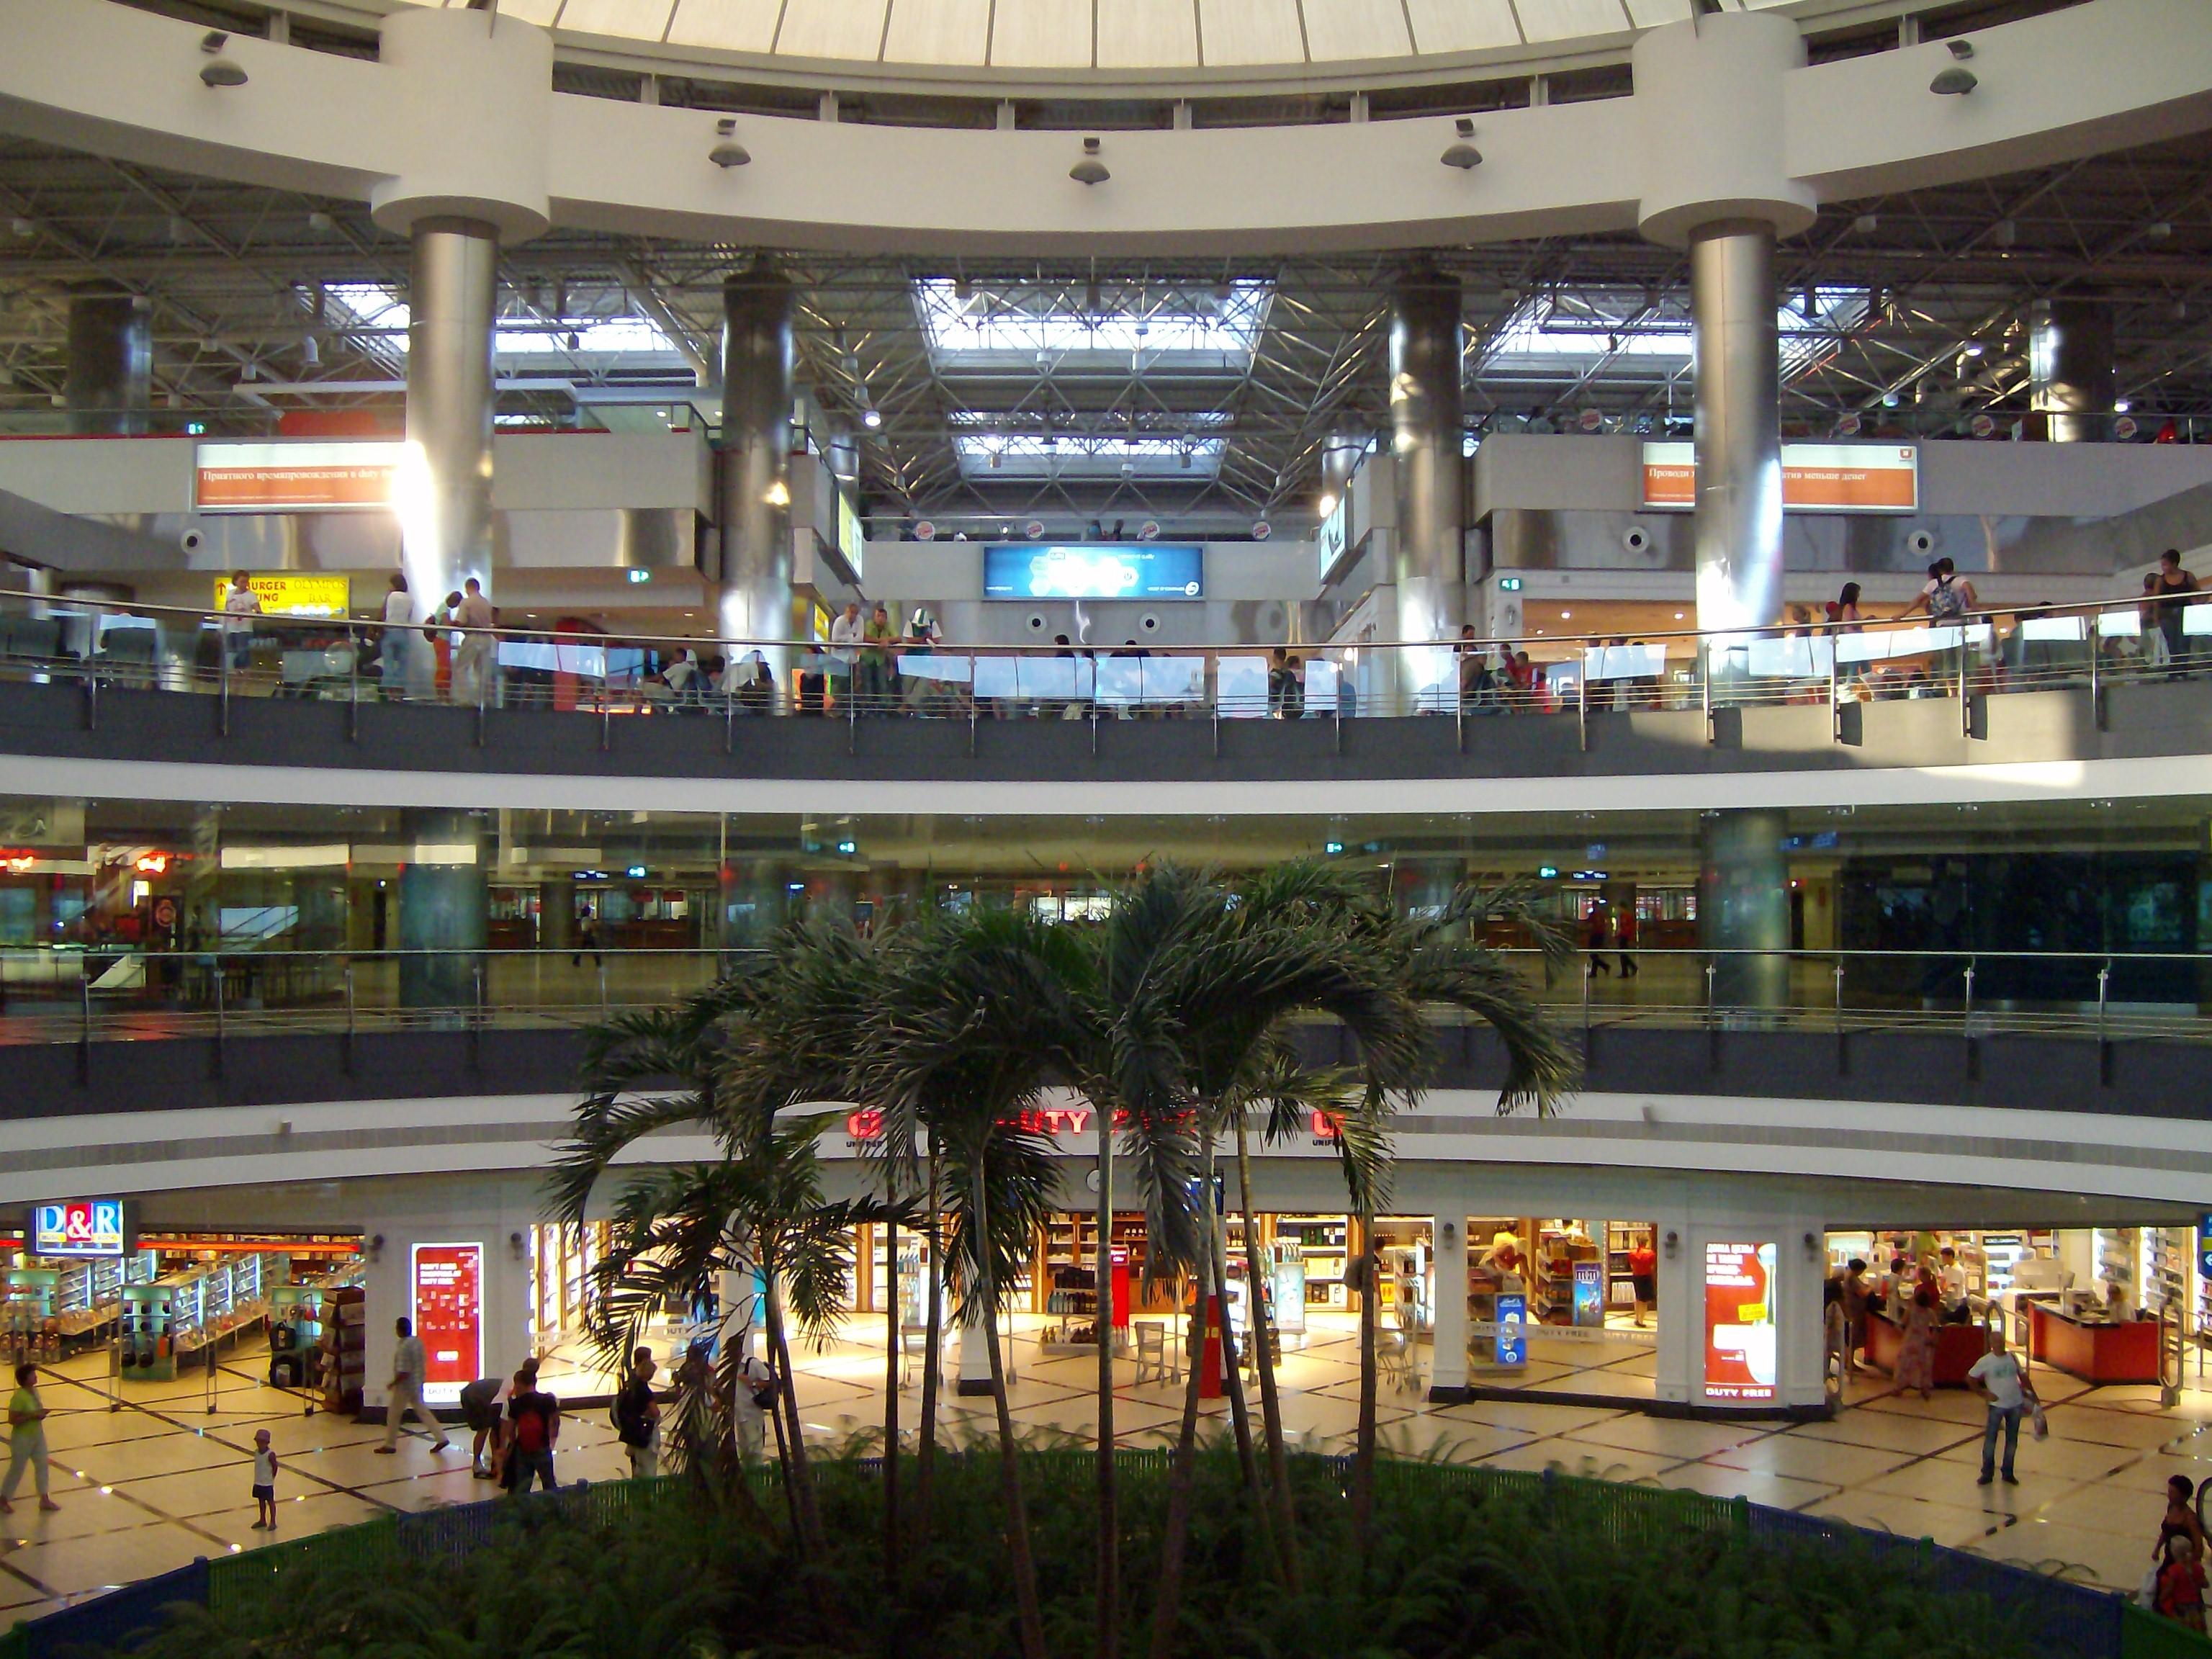 lufthavn terminal 2